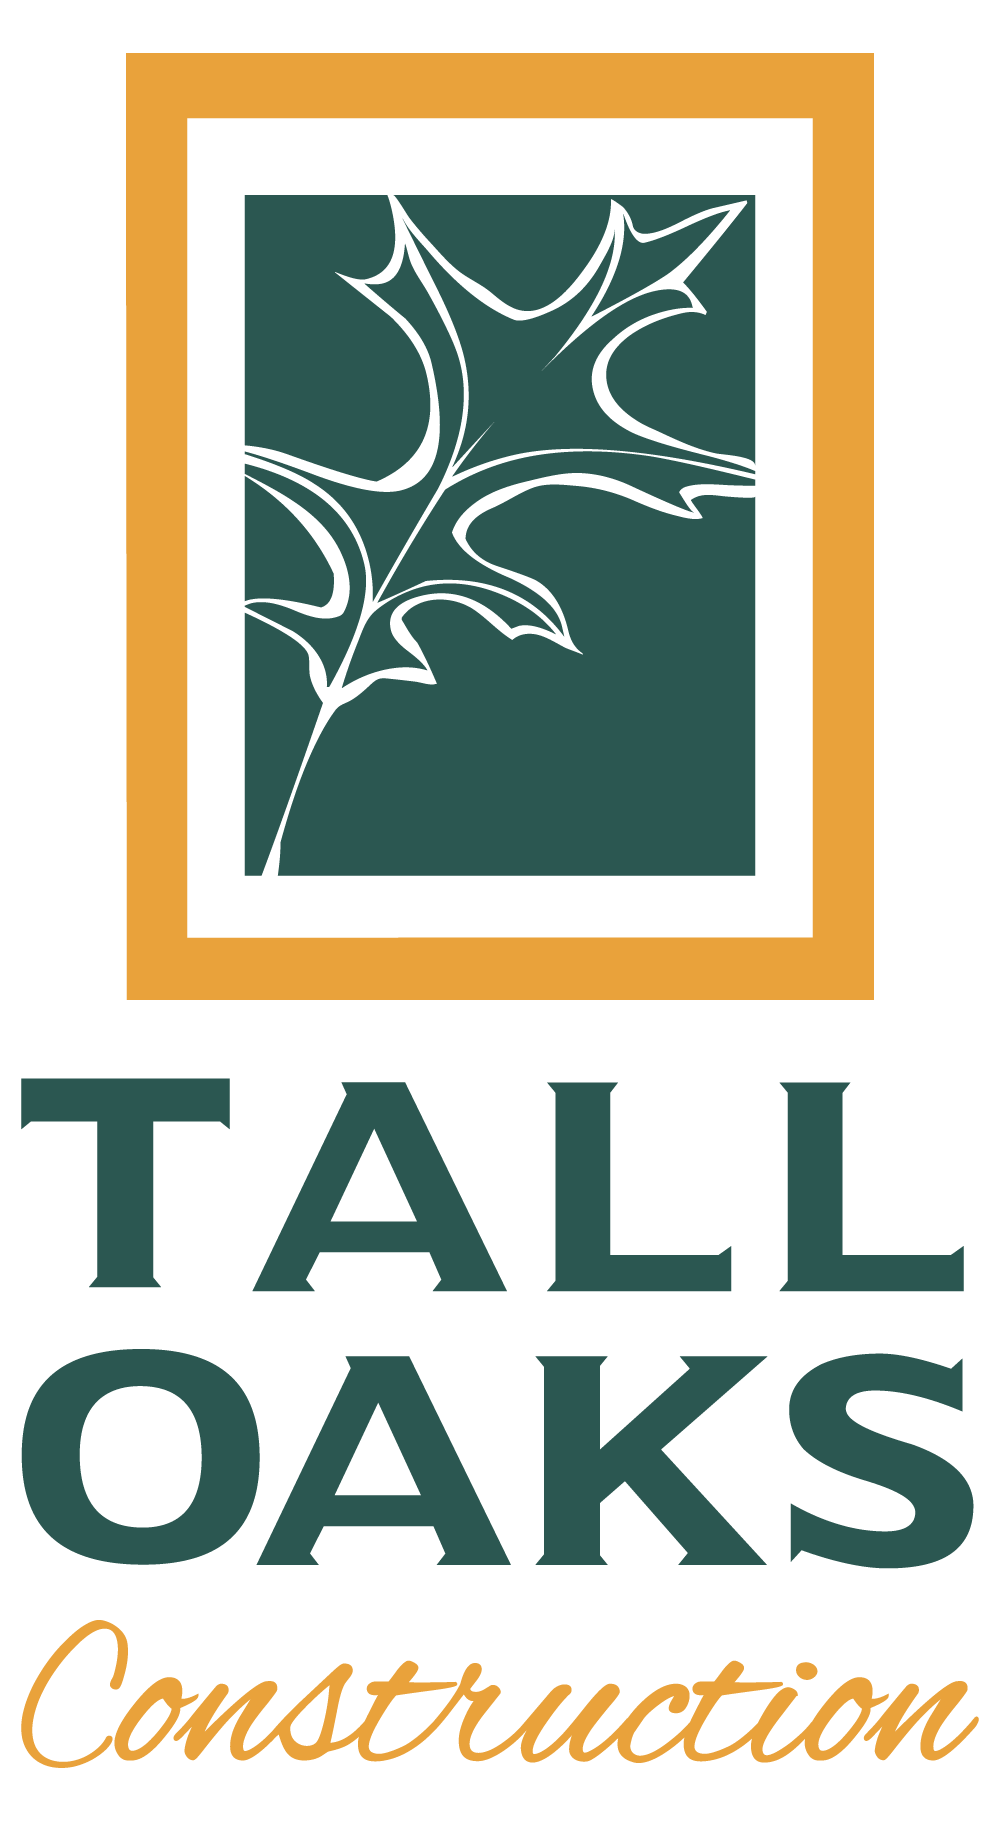 Tall Oaks Construction